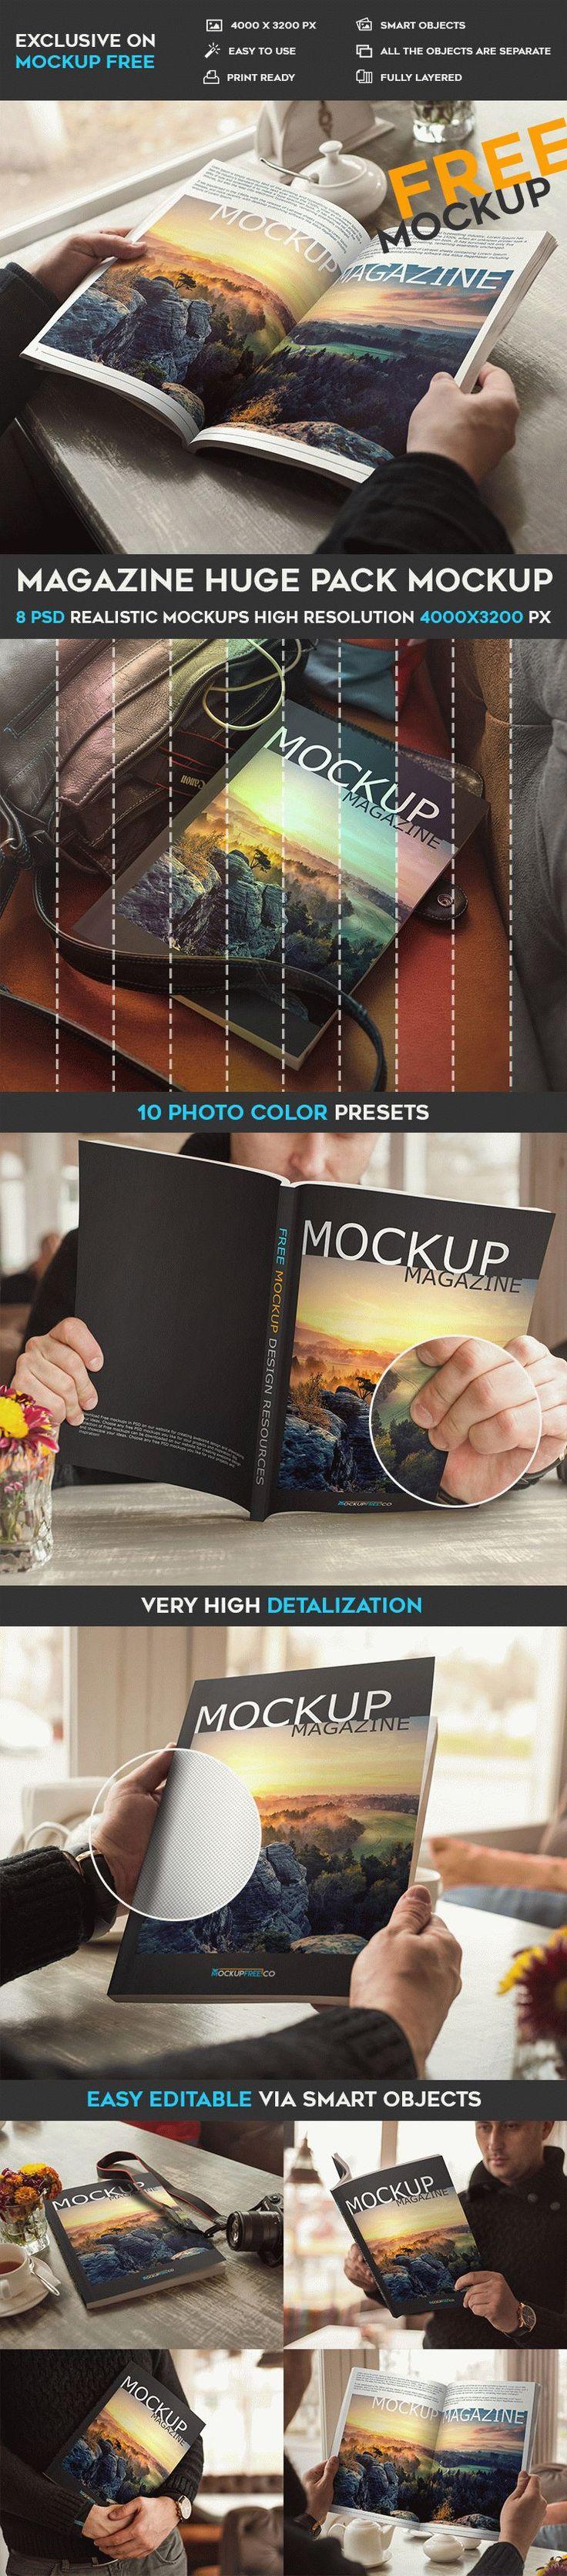 Magazine Huge Pack – 8 Free PSD Mockups   Free PSD Templates